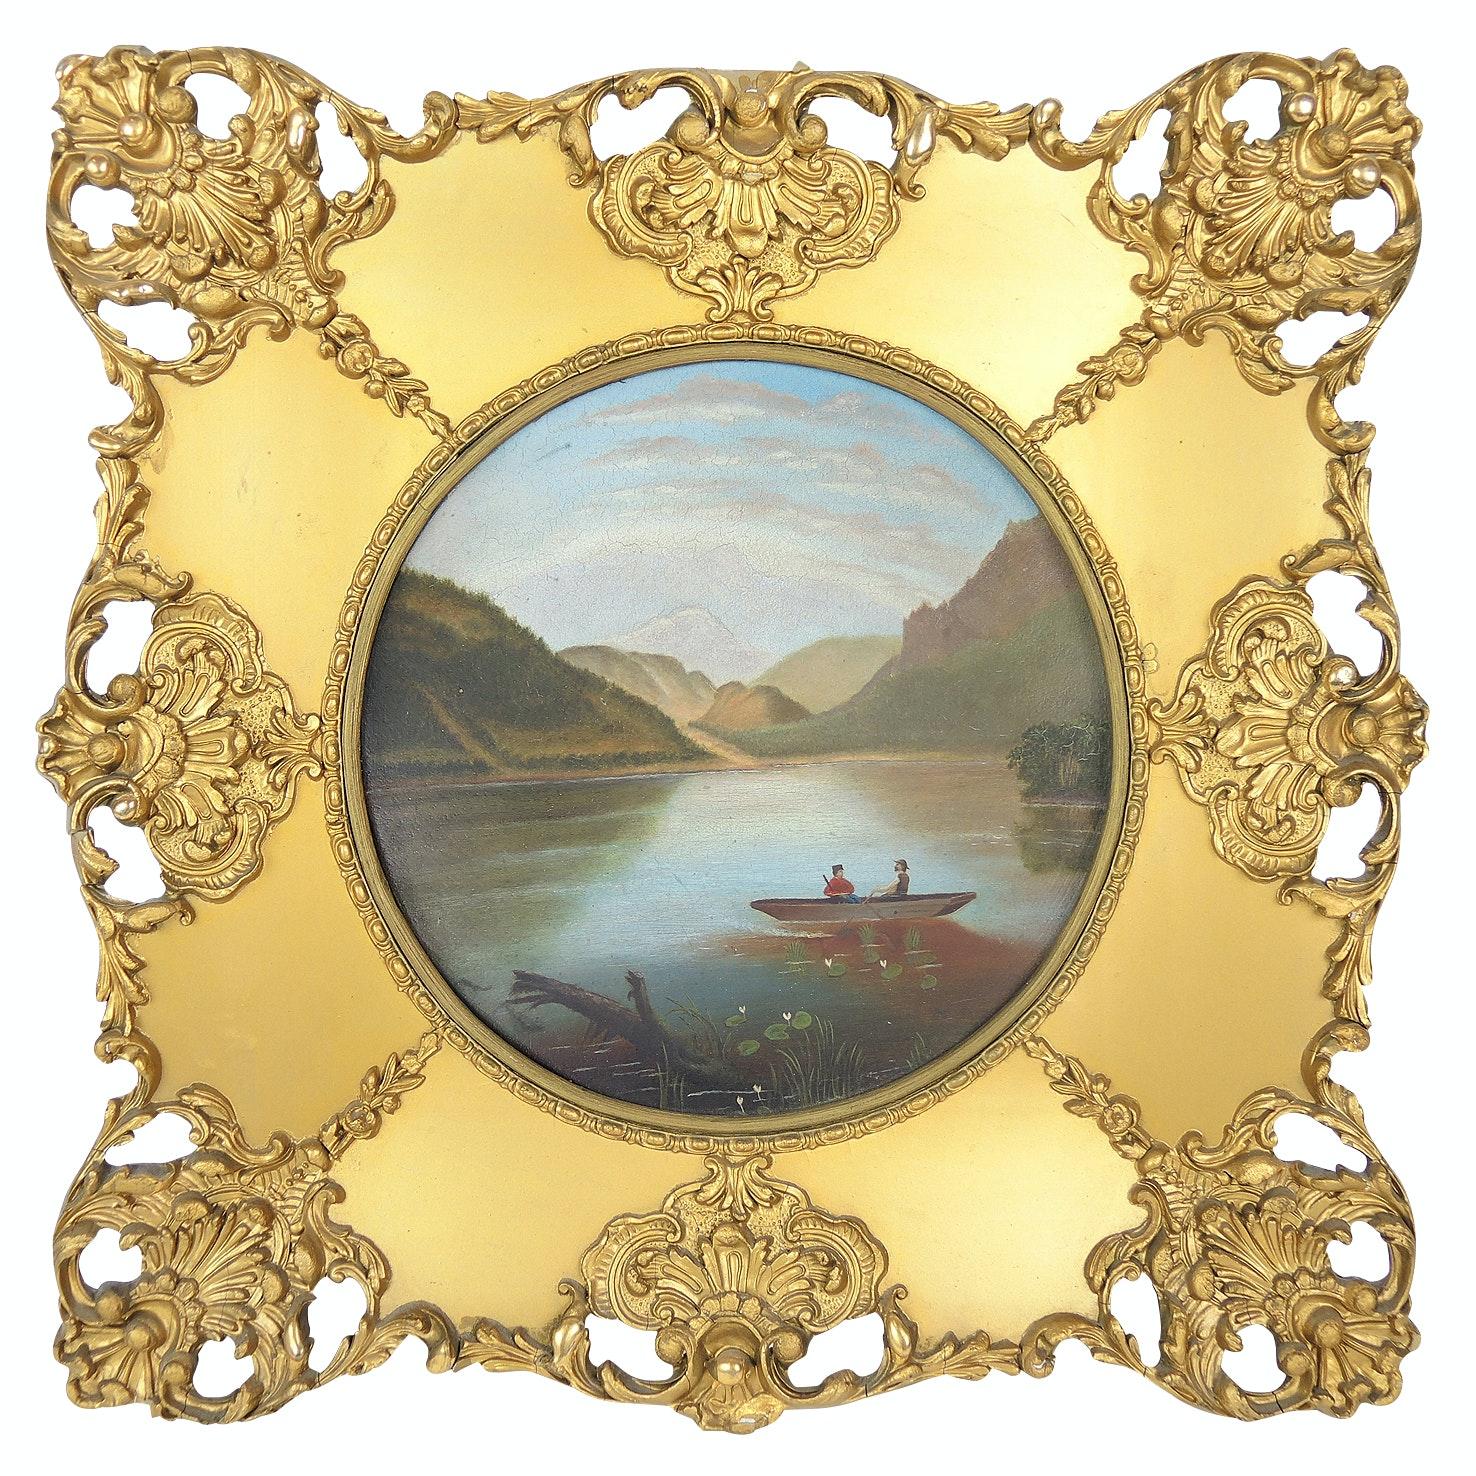 Joseph Horne Decorative Paper-Mache Wall Plate